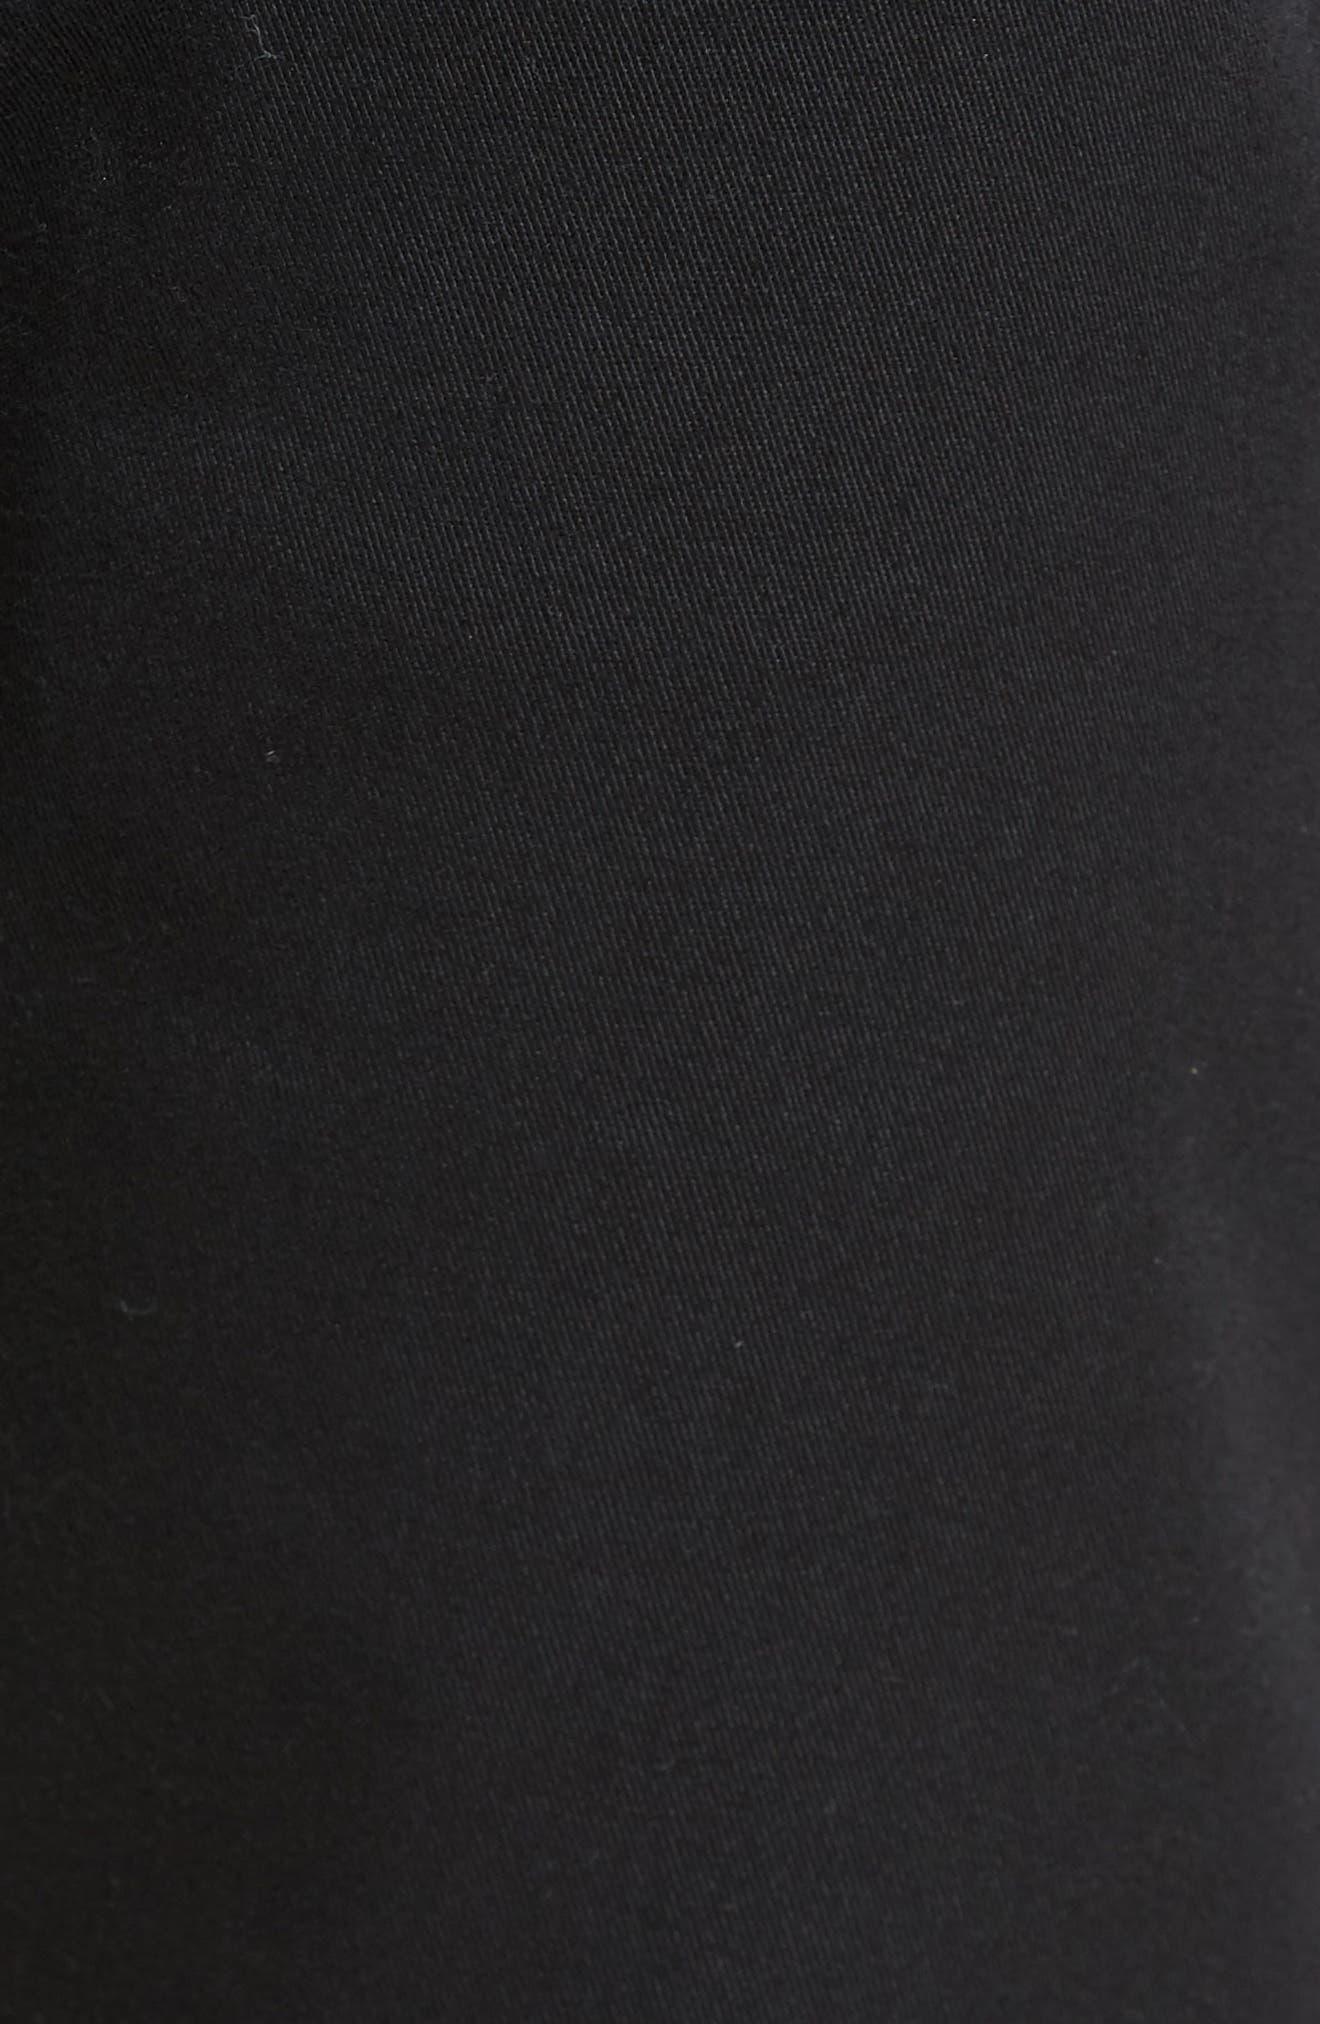 V56 Covina II Slim Fit Pants,                             Alternate thumbnail 6, color,                             001